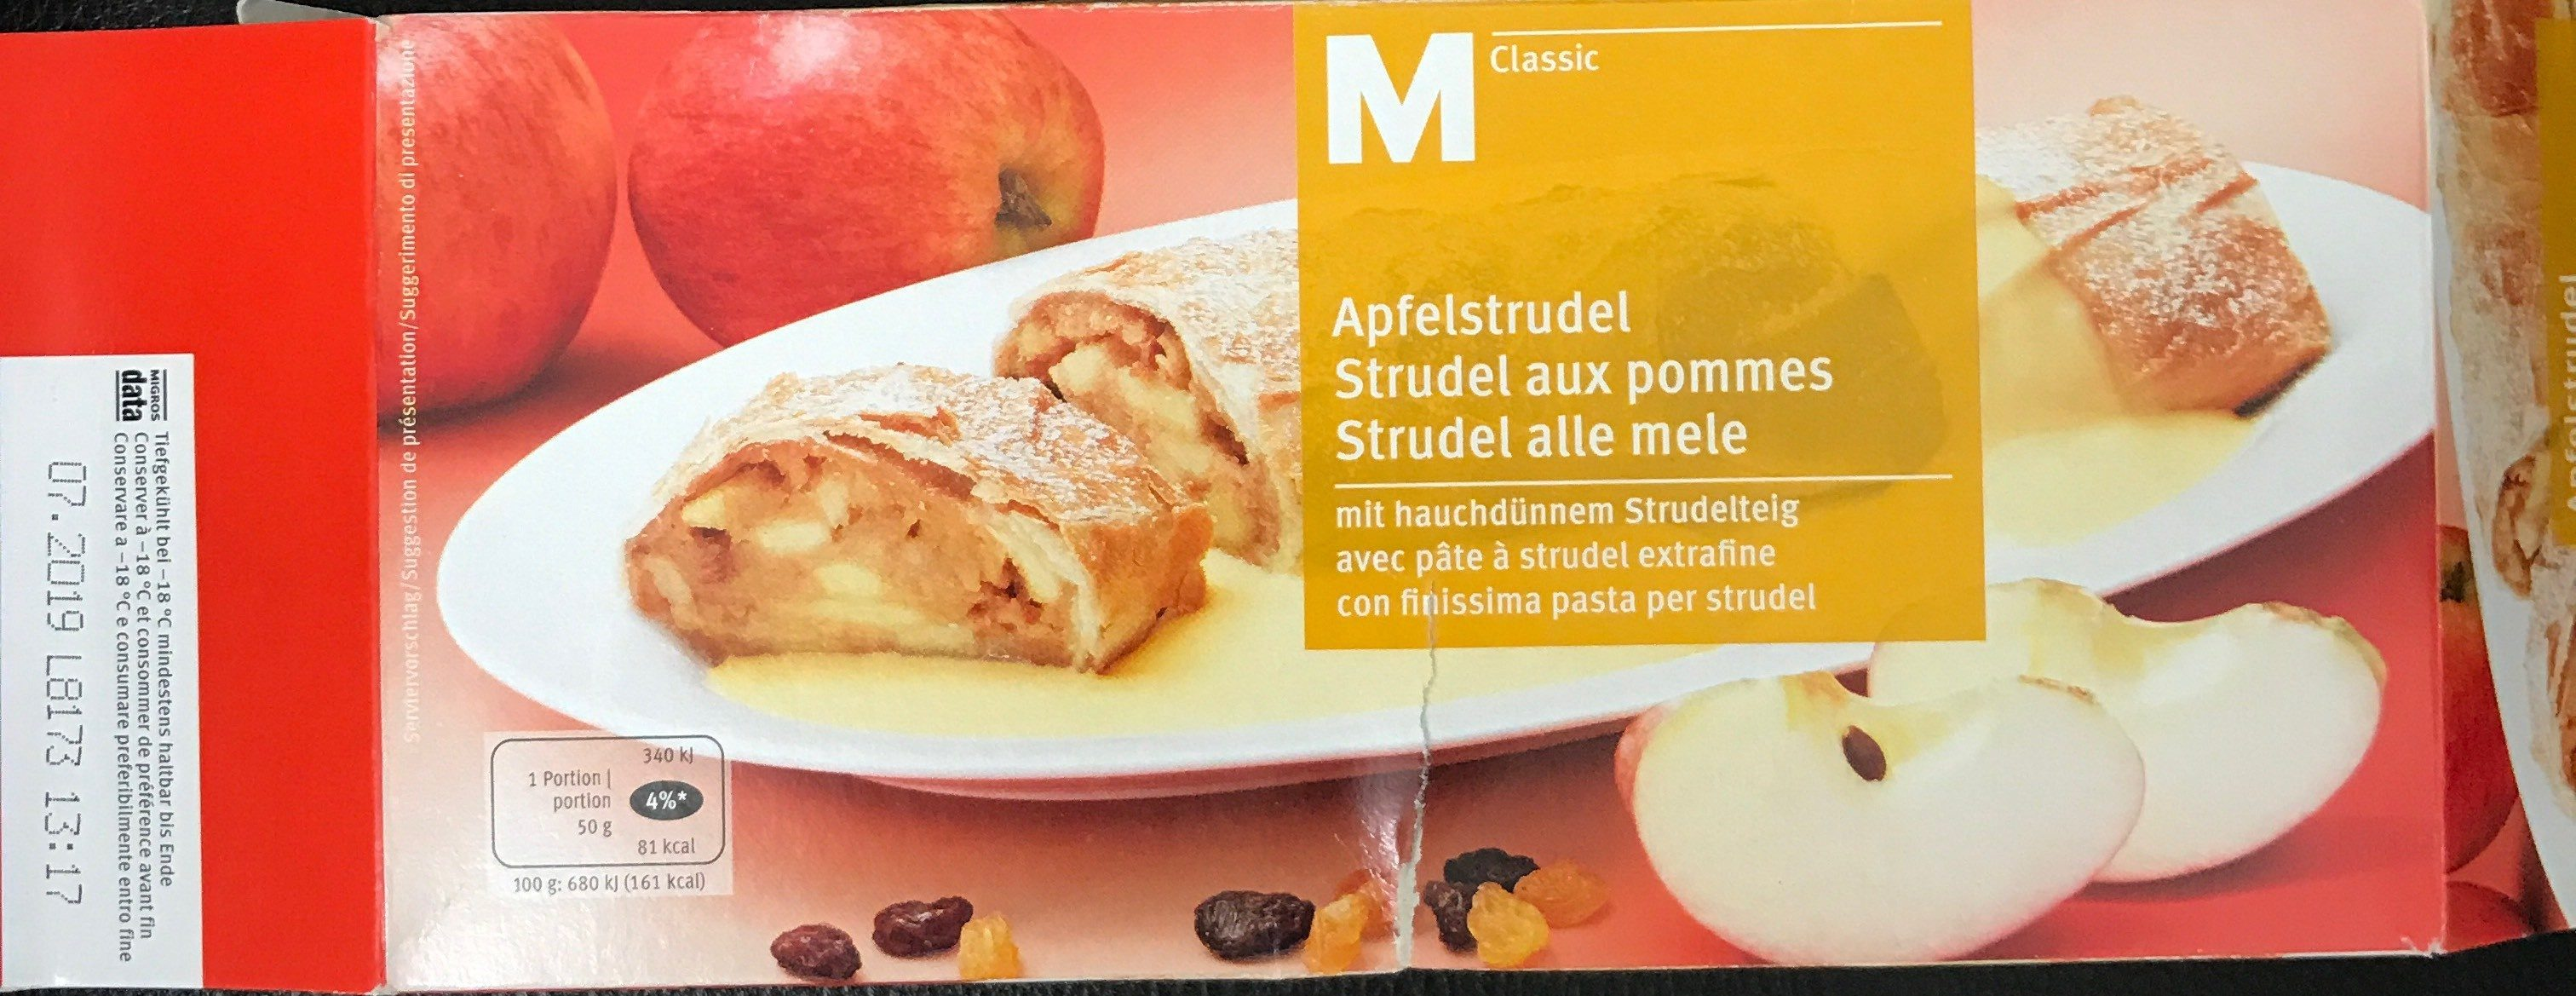 Strudel aux pommes - Product - fr